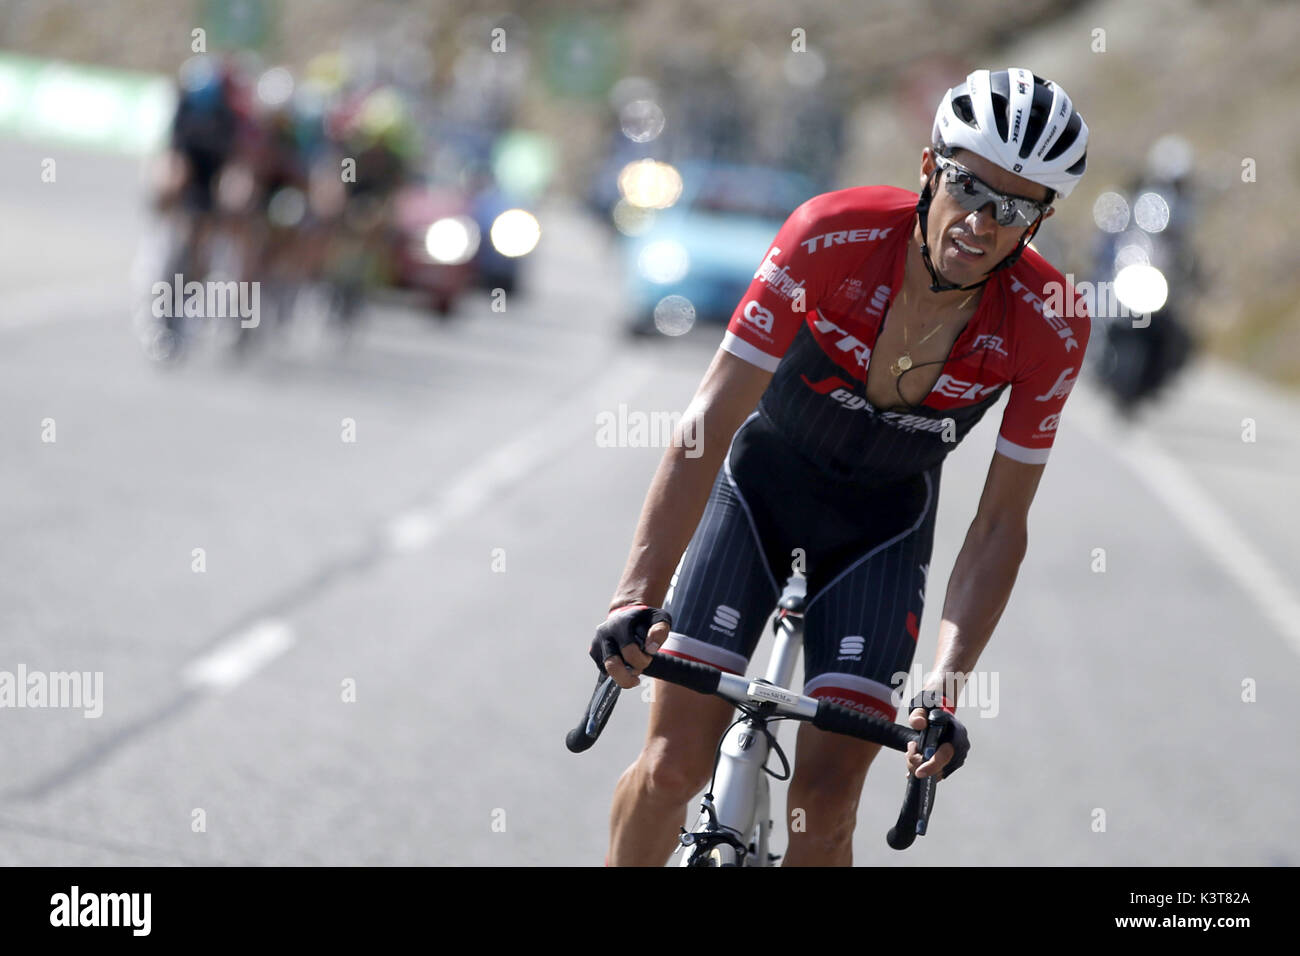 98c760dac Spanish Cyclist Alberto Contador Team Stock Photos   Spanish Cyclist ...